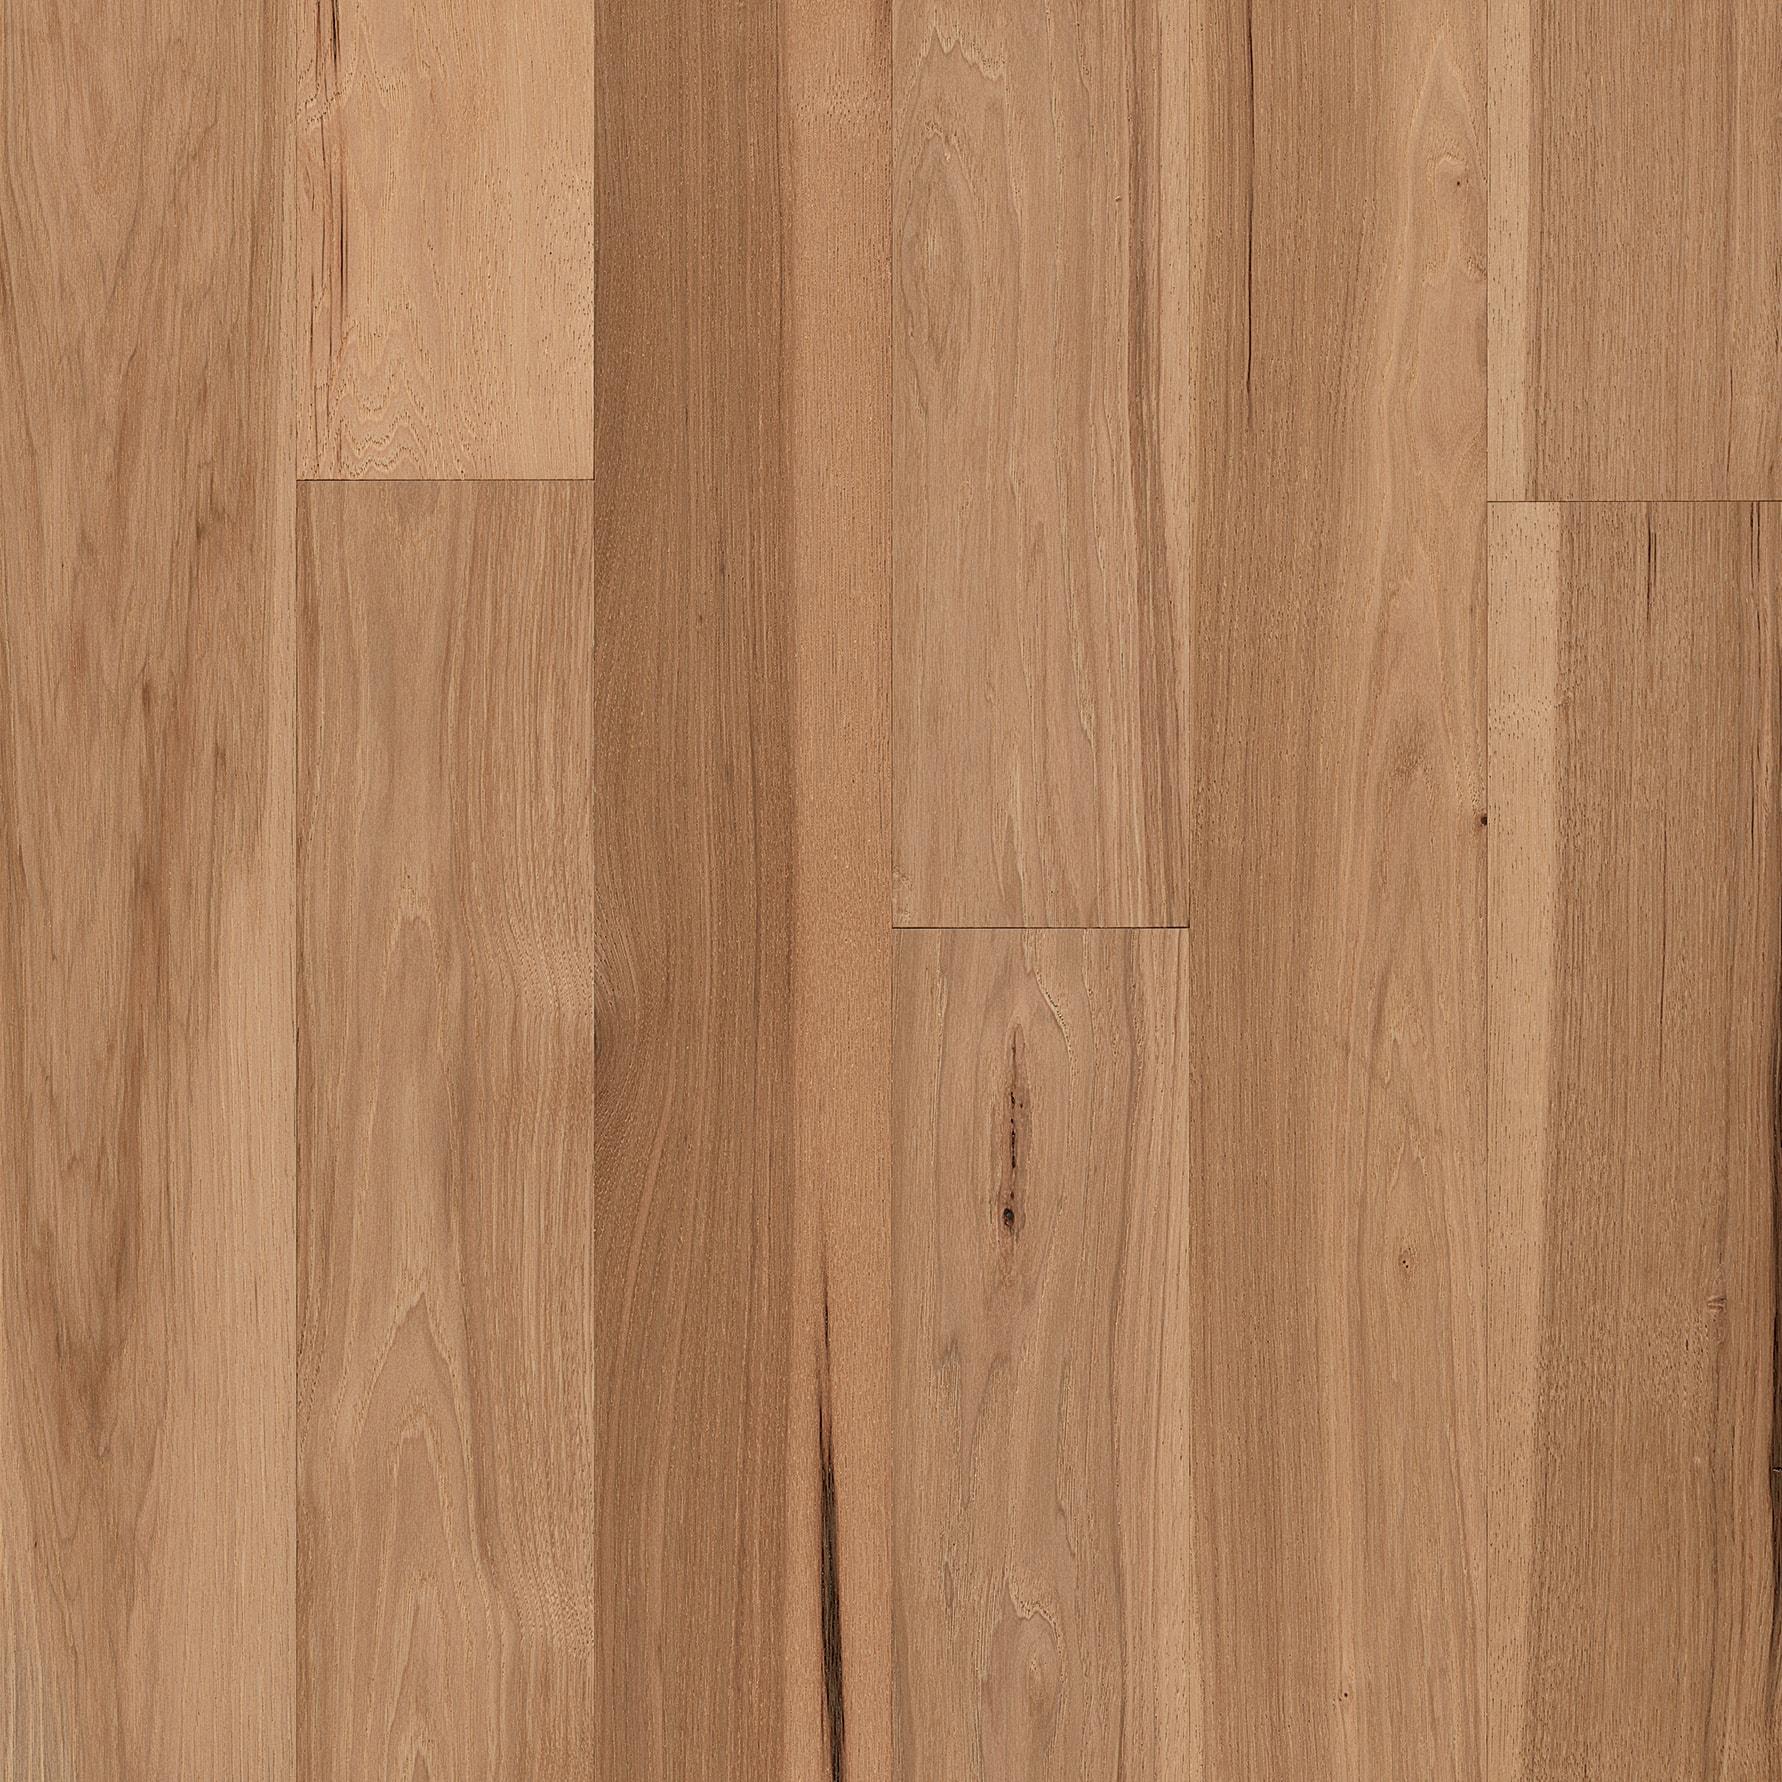 Natural hardwood floor